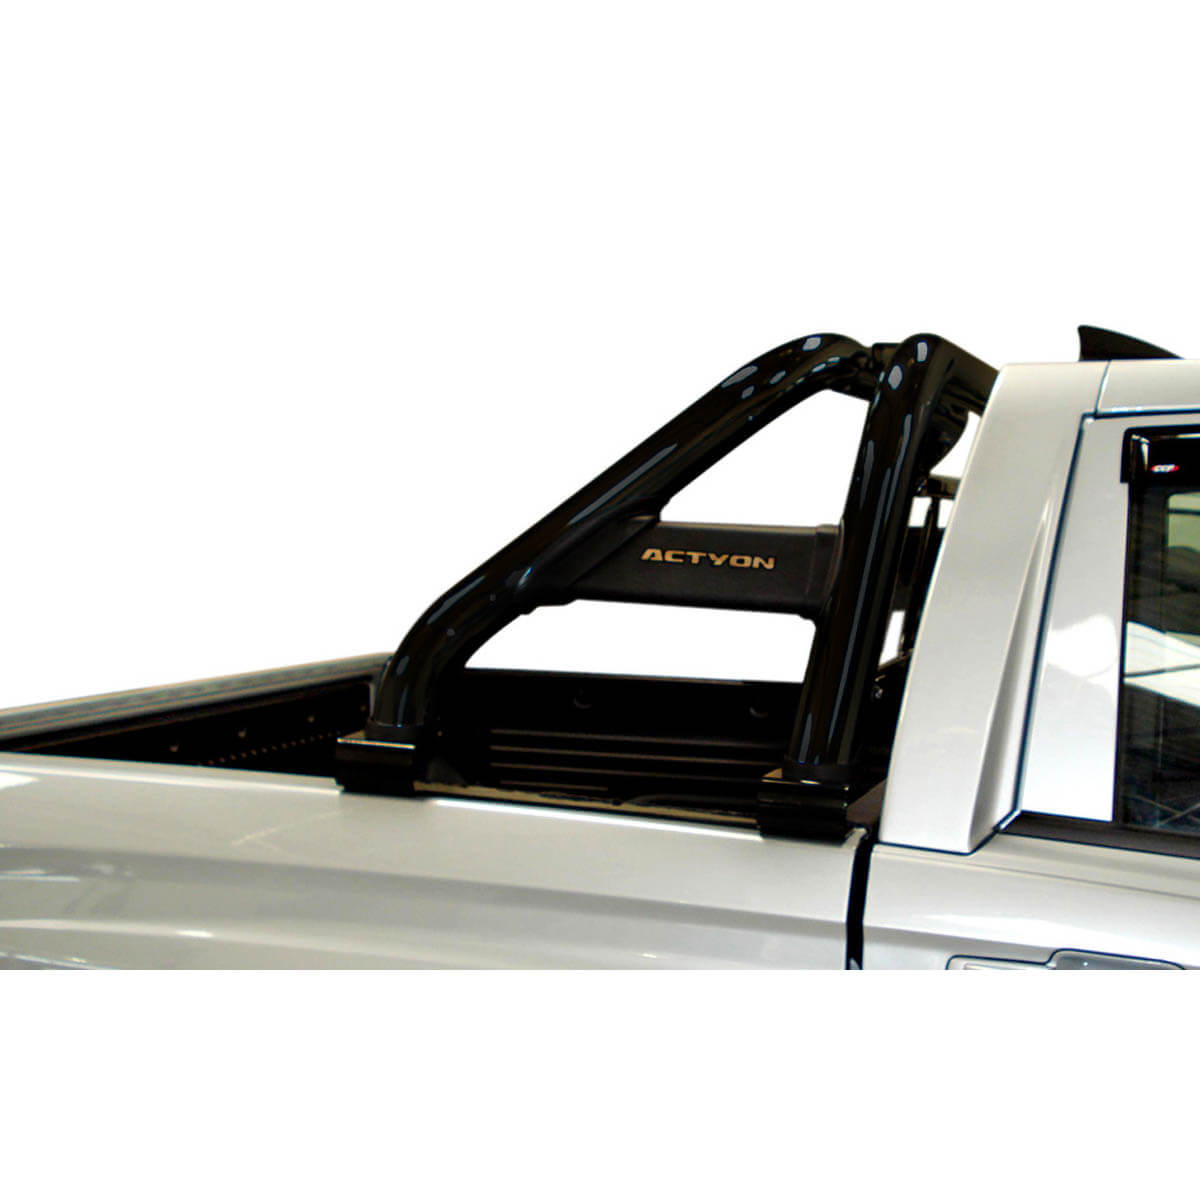 Santo antônio duplo preto Actyon Sports 2007 a 2015 com barras de vidro